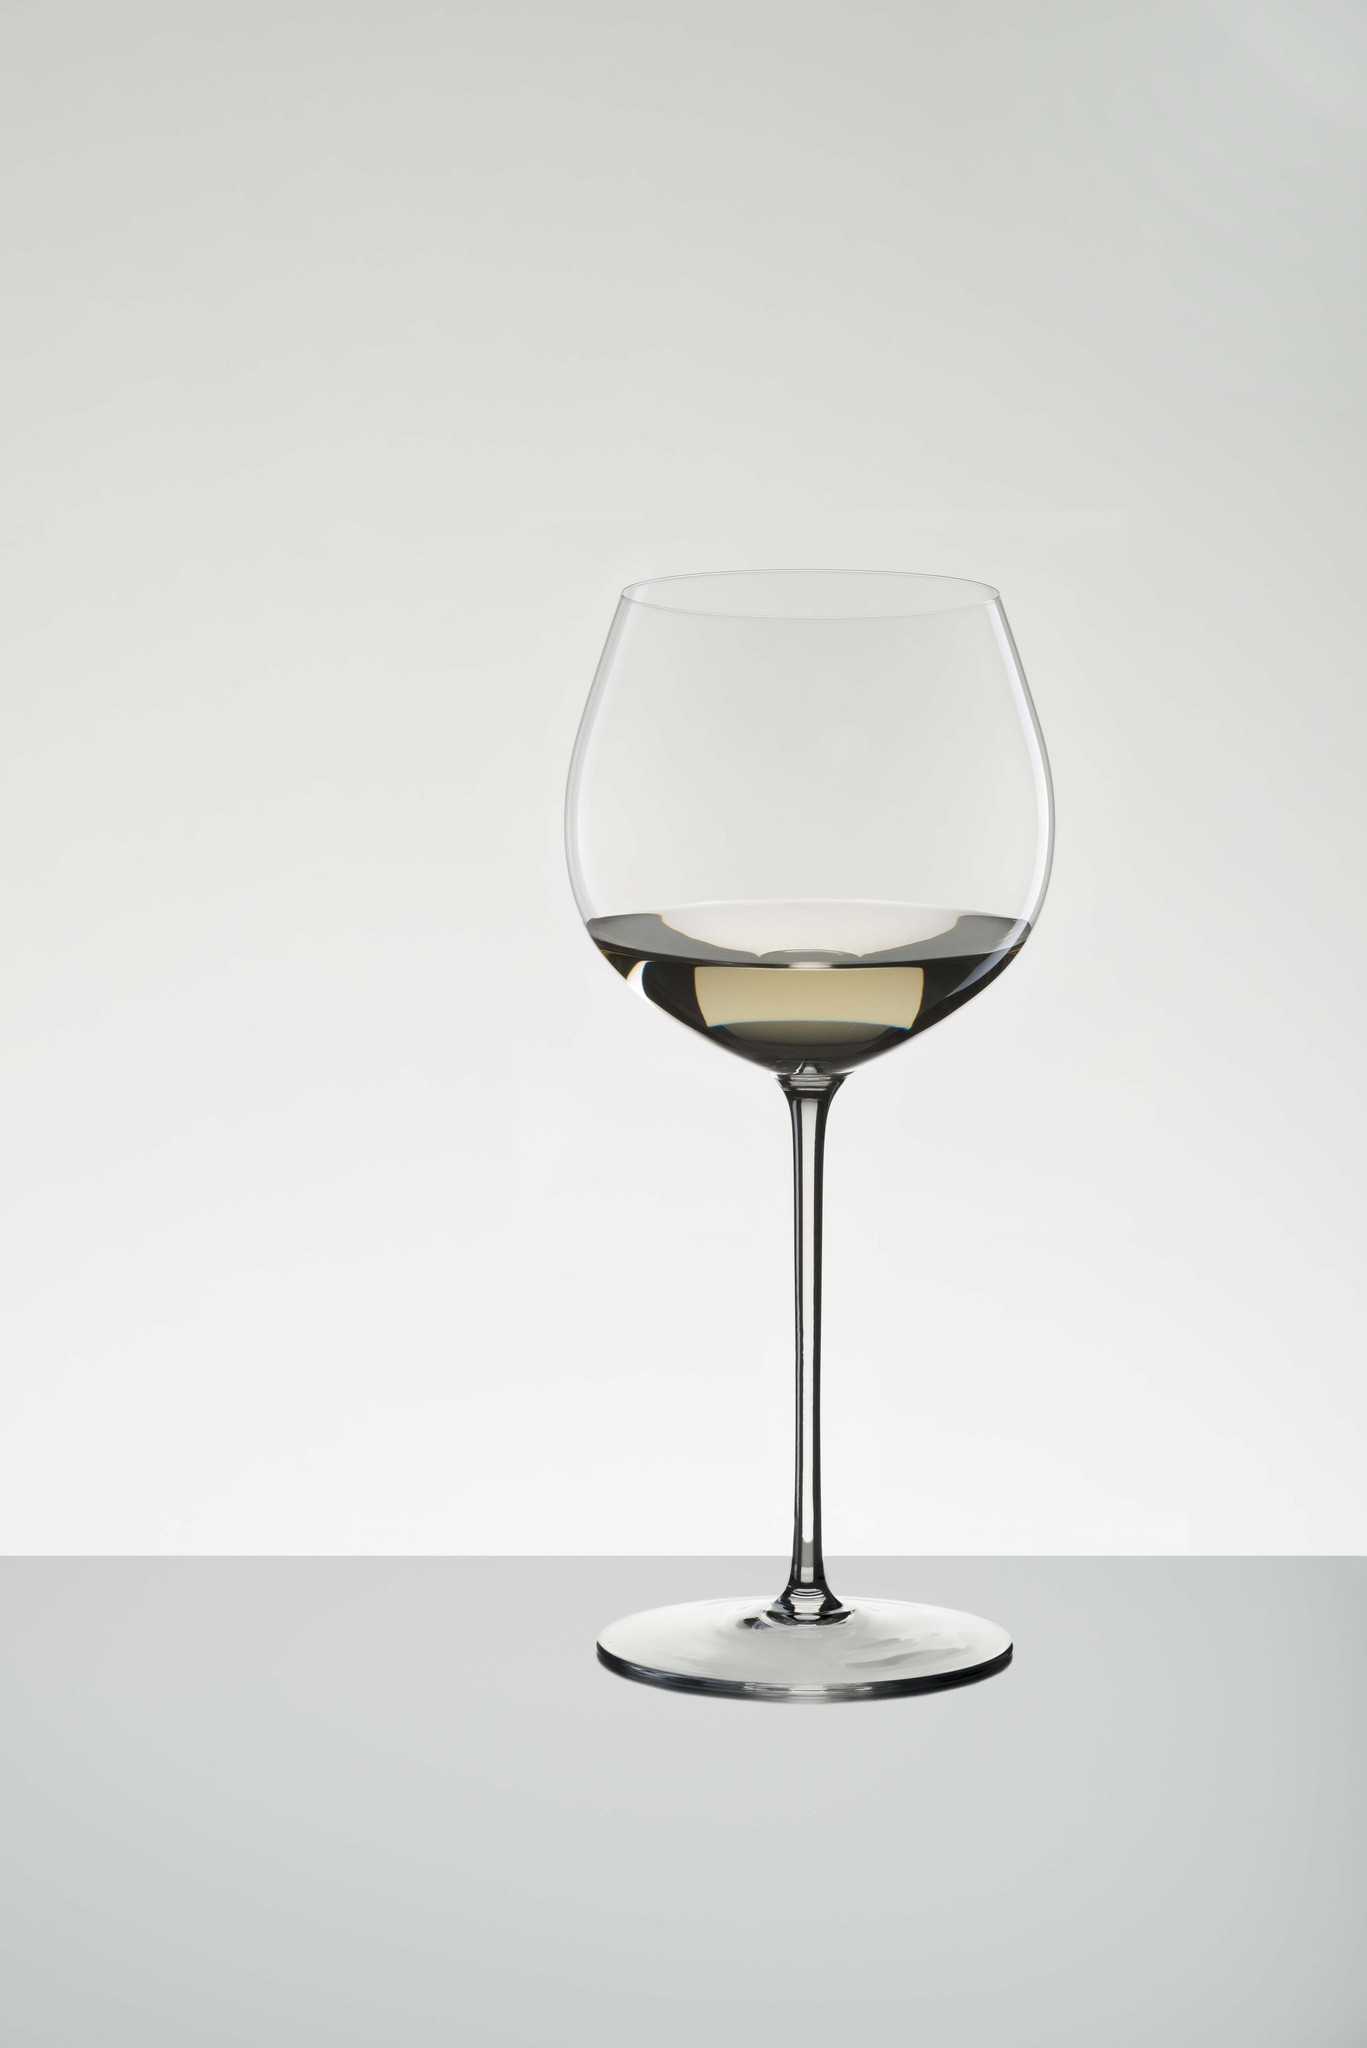 Бокалы Бокал для белого вина 520мл Riedel Superleggero Oaked Chardonnay bokal-dlya-belogo-vina-520ml-riedel-superleggero-oaked-chardonnay-avstriya.jpg